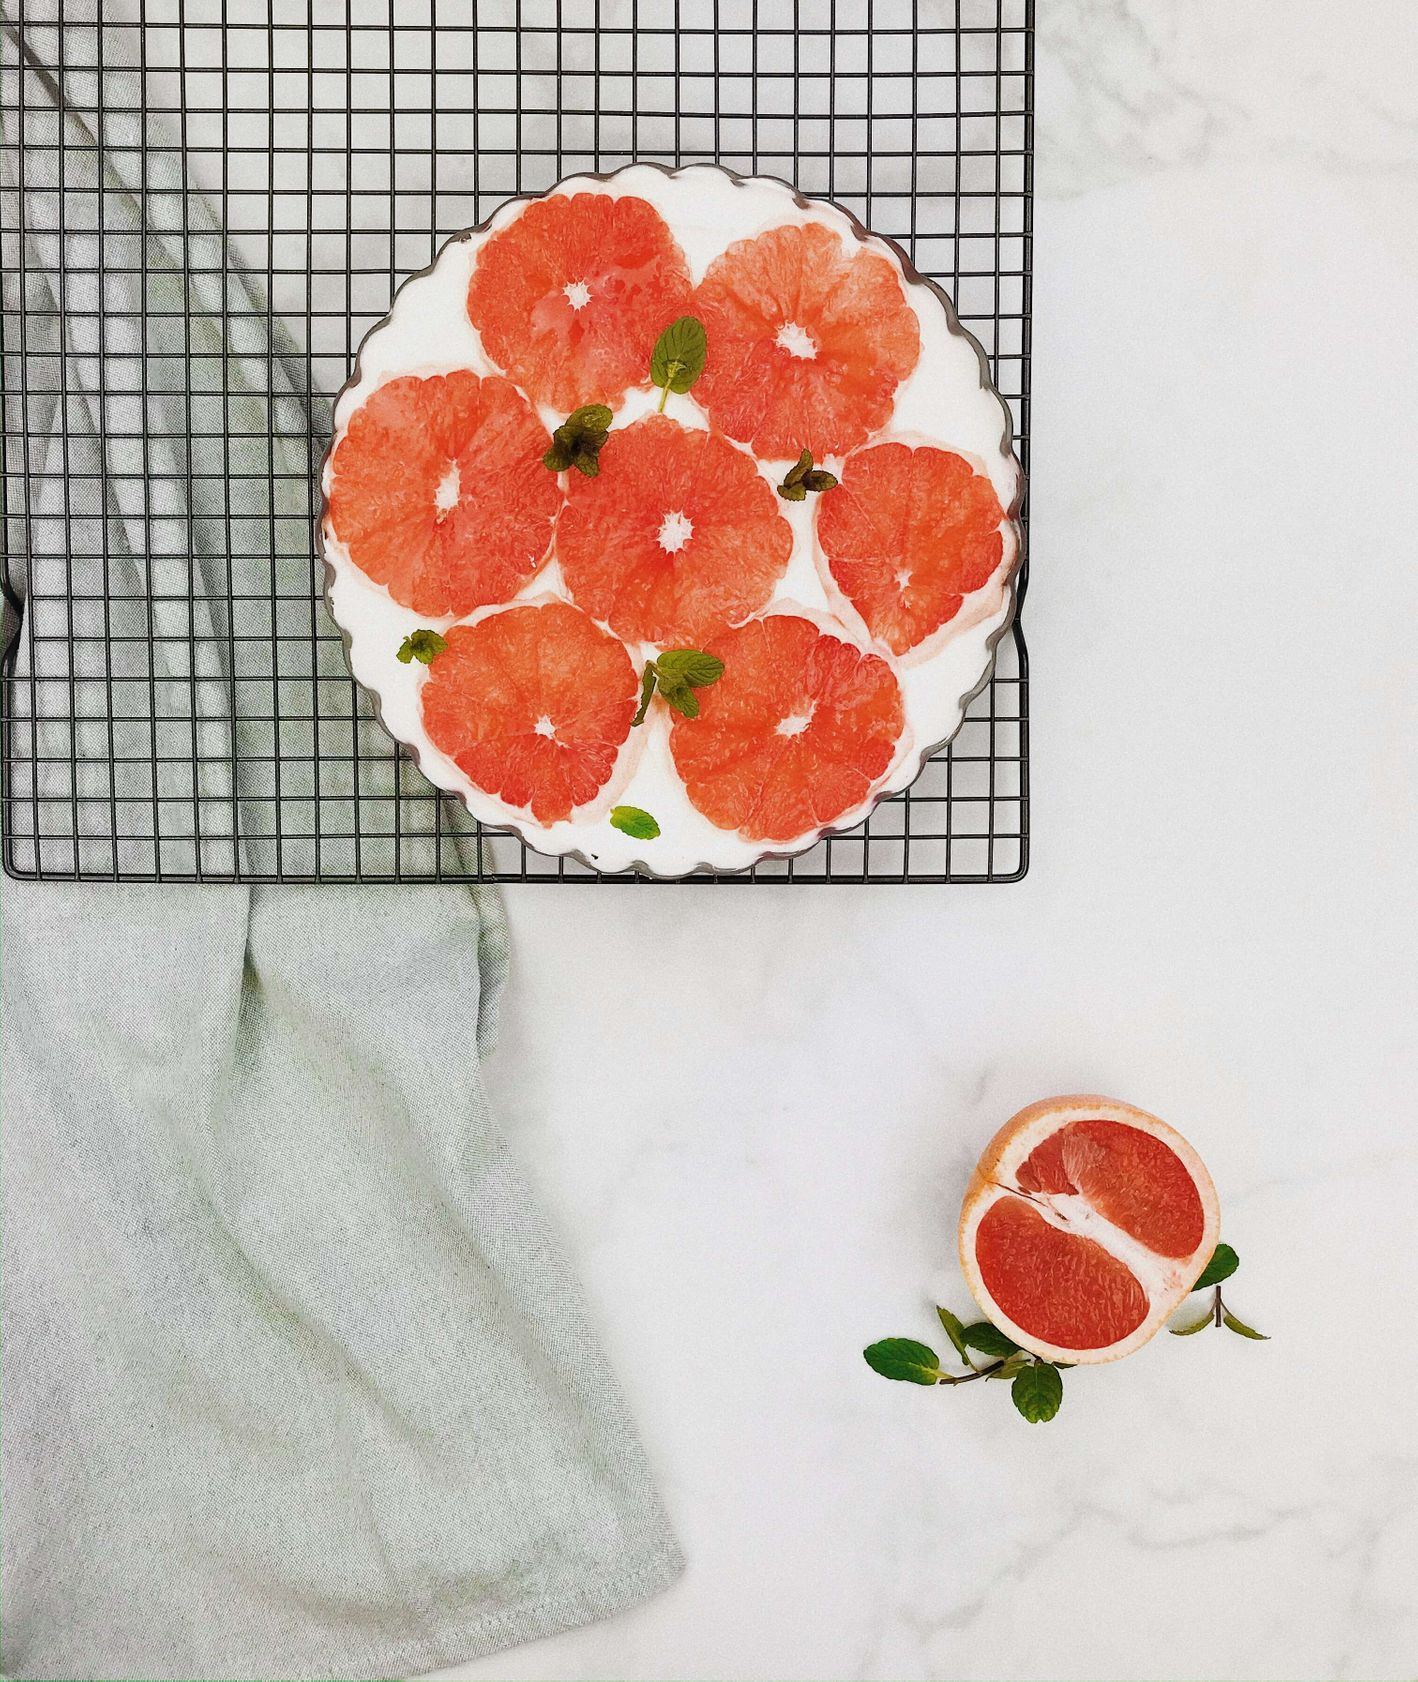 Prosty deser z grejpfrutem (fot. Izabela Heftowicz / PassionOn)